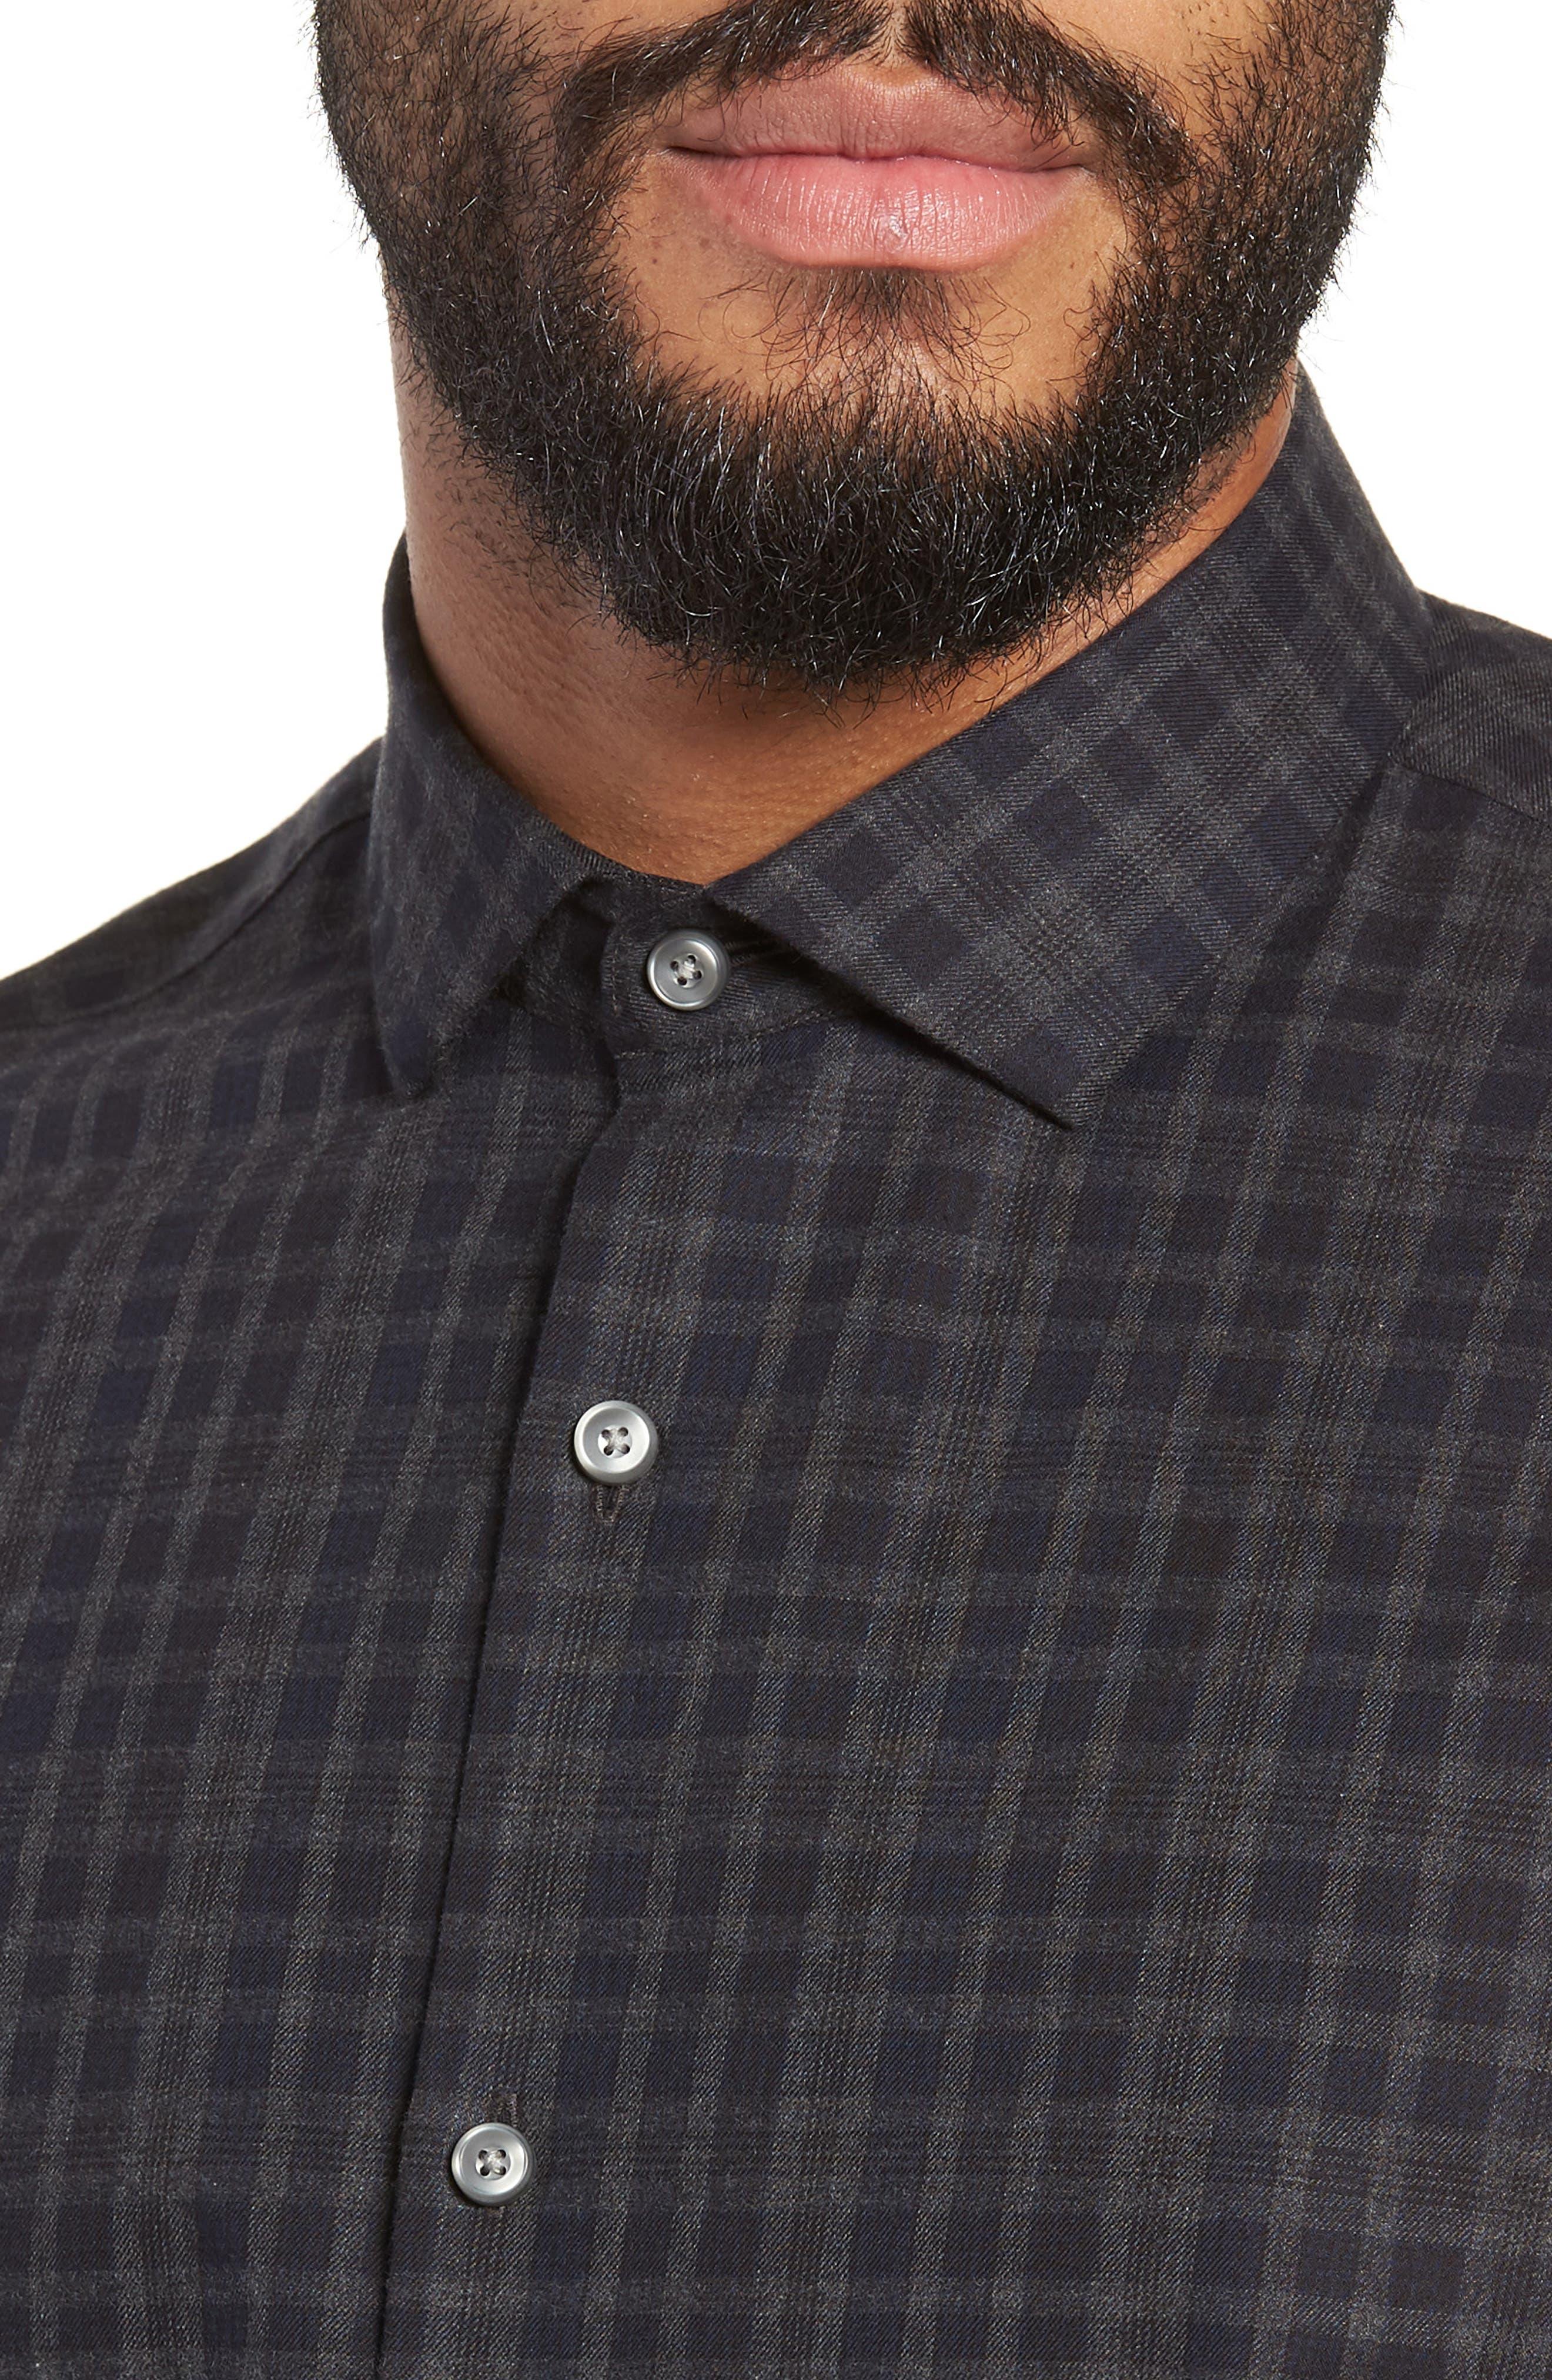 Slim Fit Check Flannel Sport Shirt,                             Alternate thumbnail 4, color,                             BLACK HEATHER NAVY CHECK